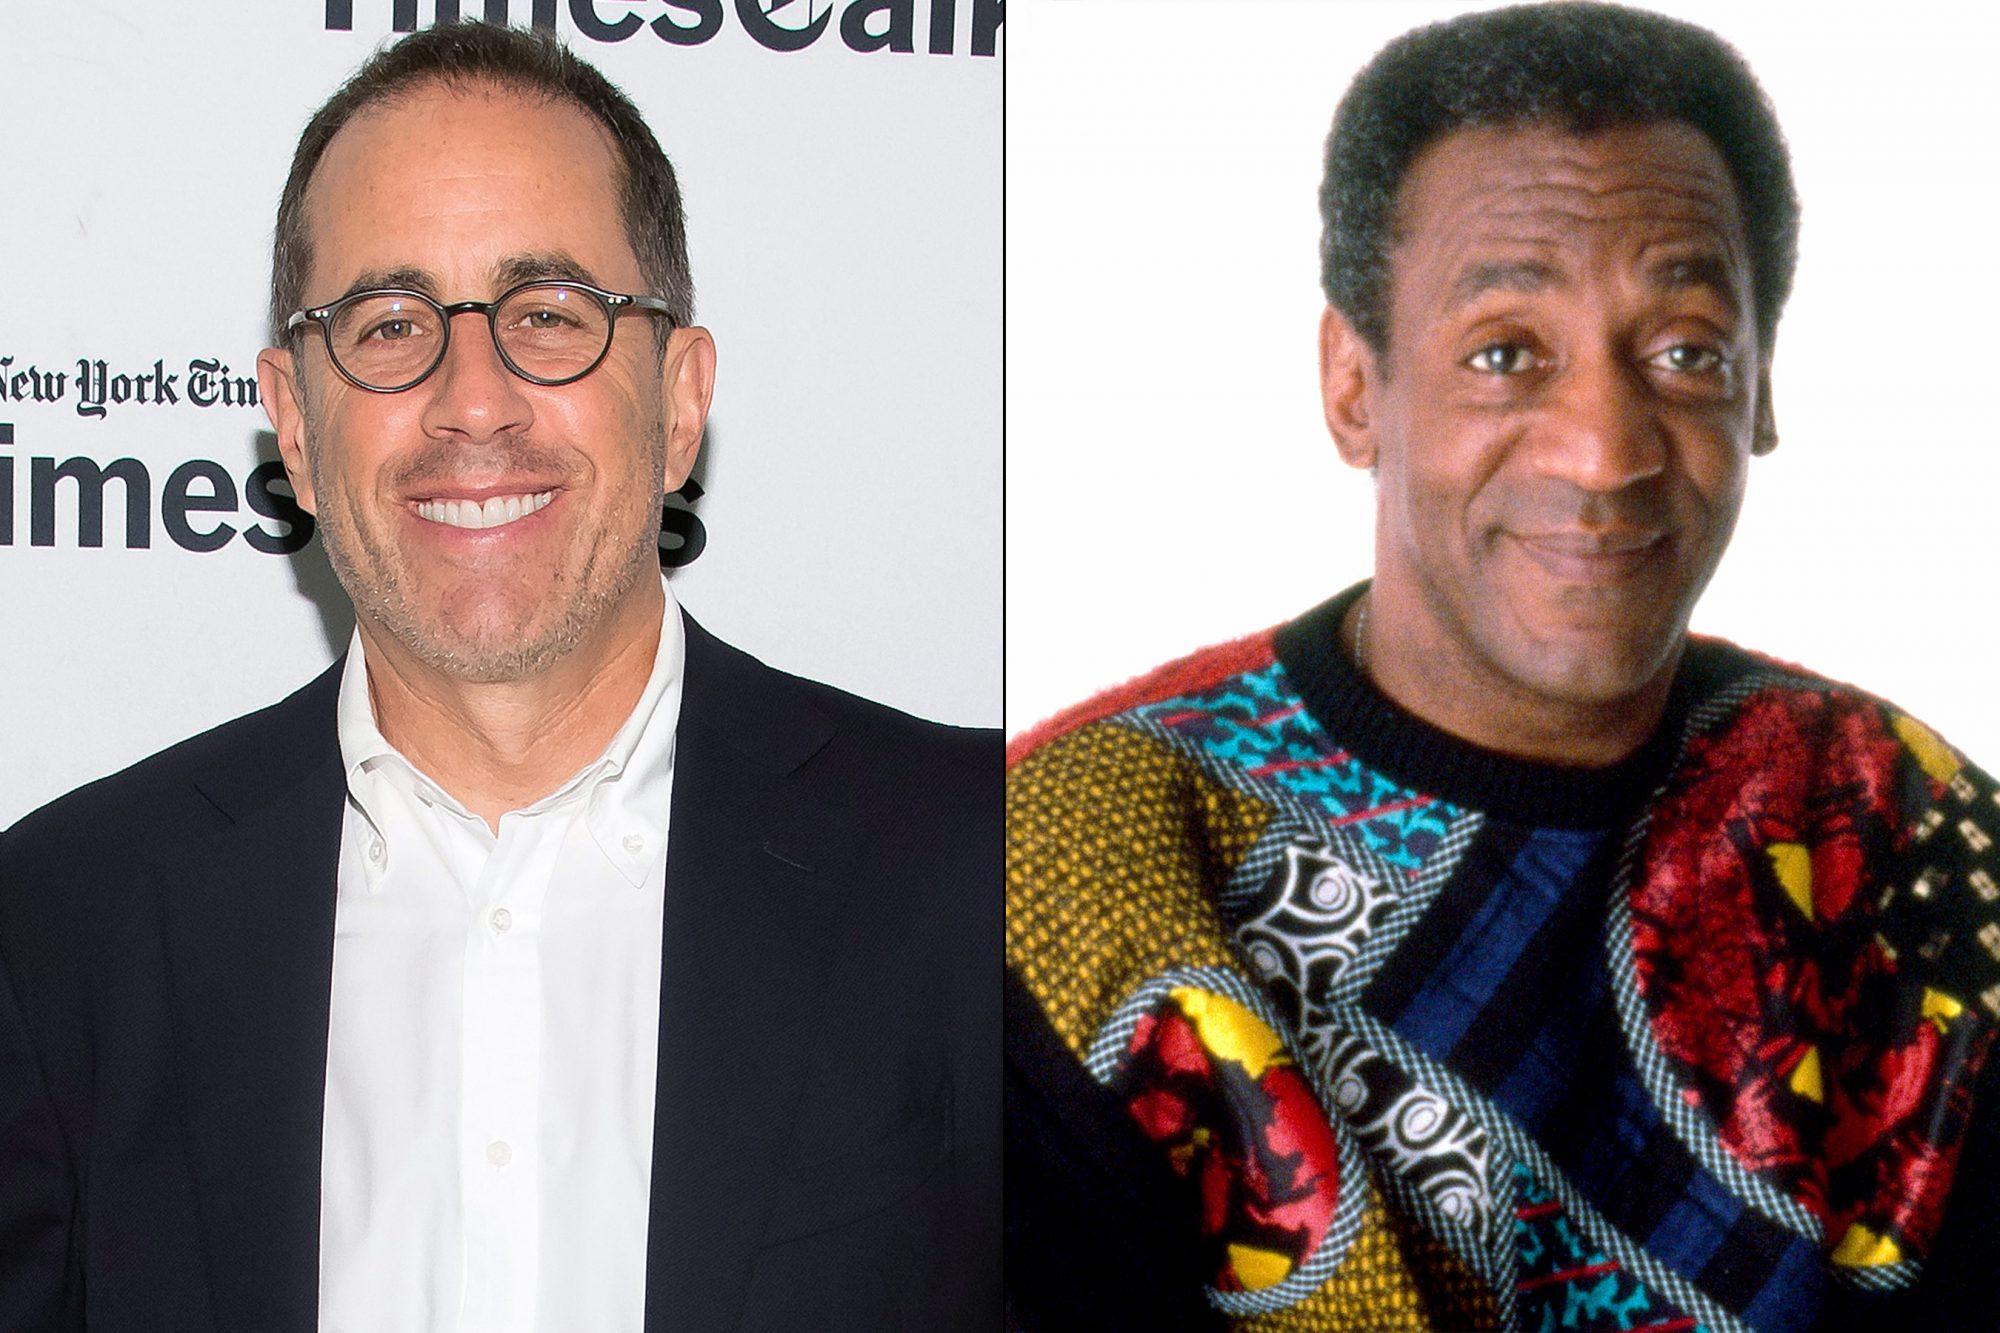 Jerry Seinfeld / Bill Cosby